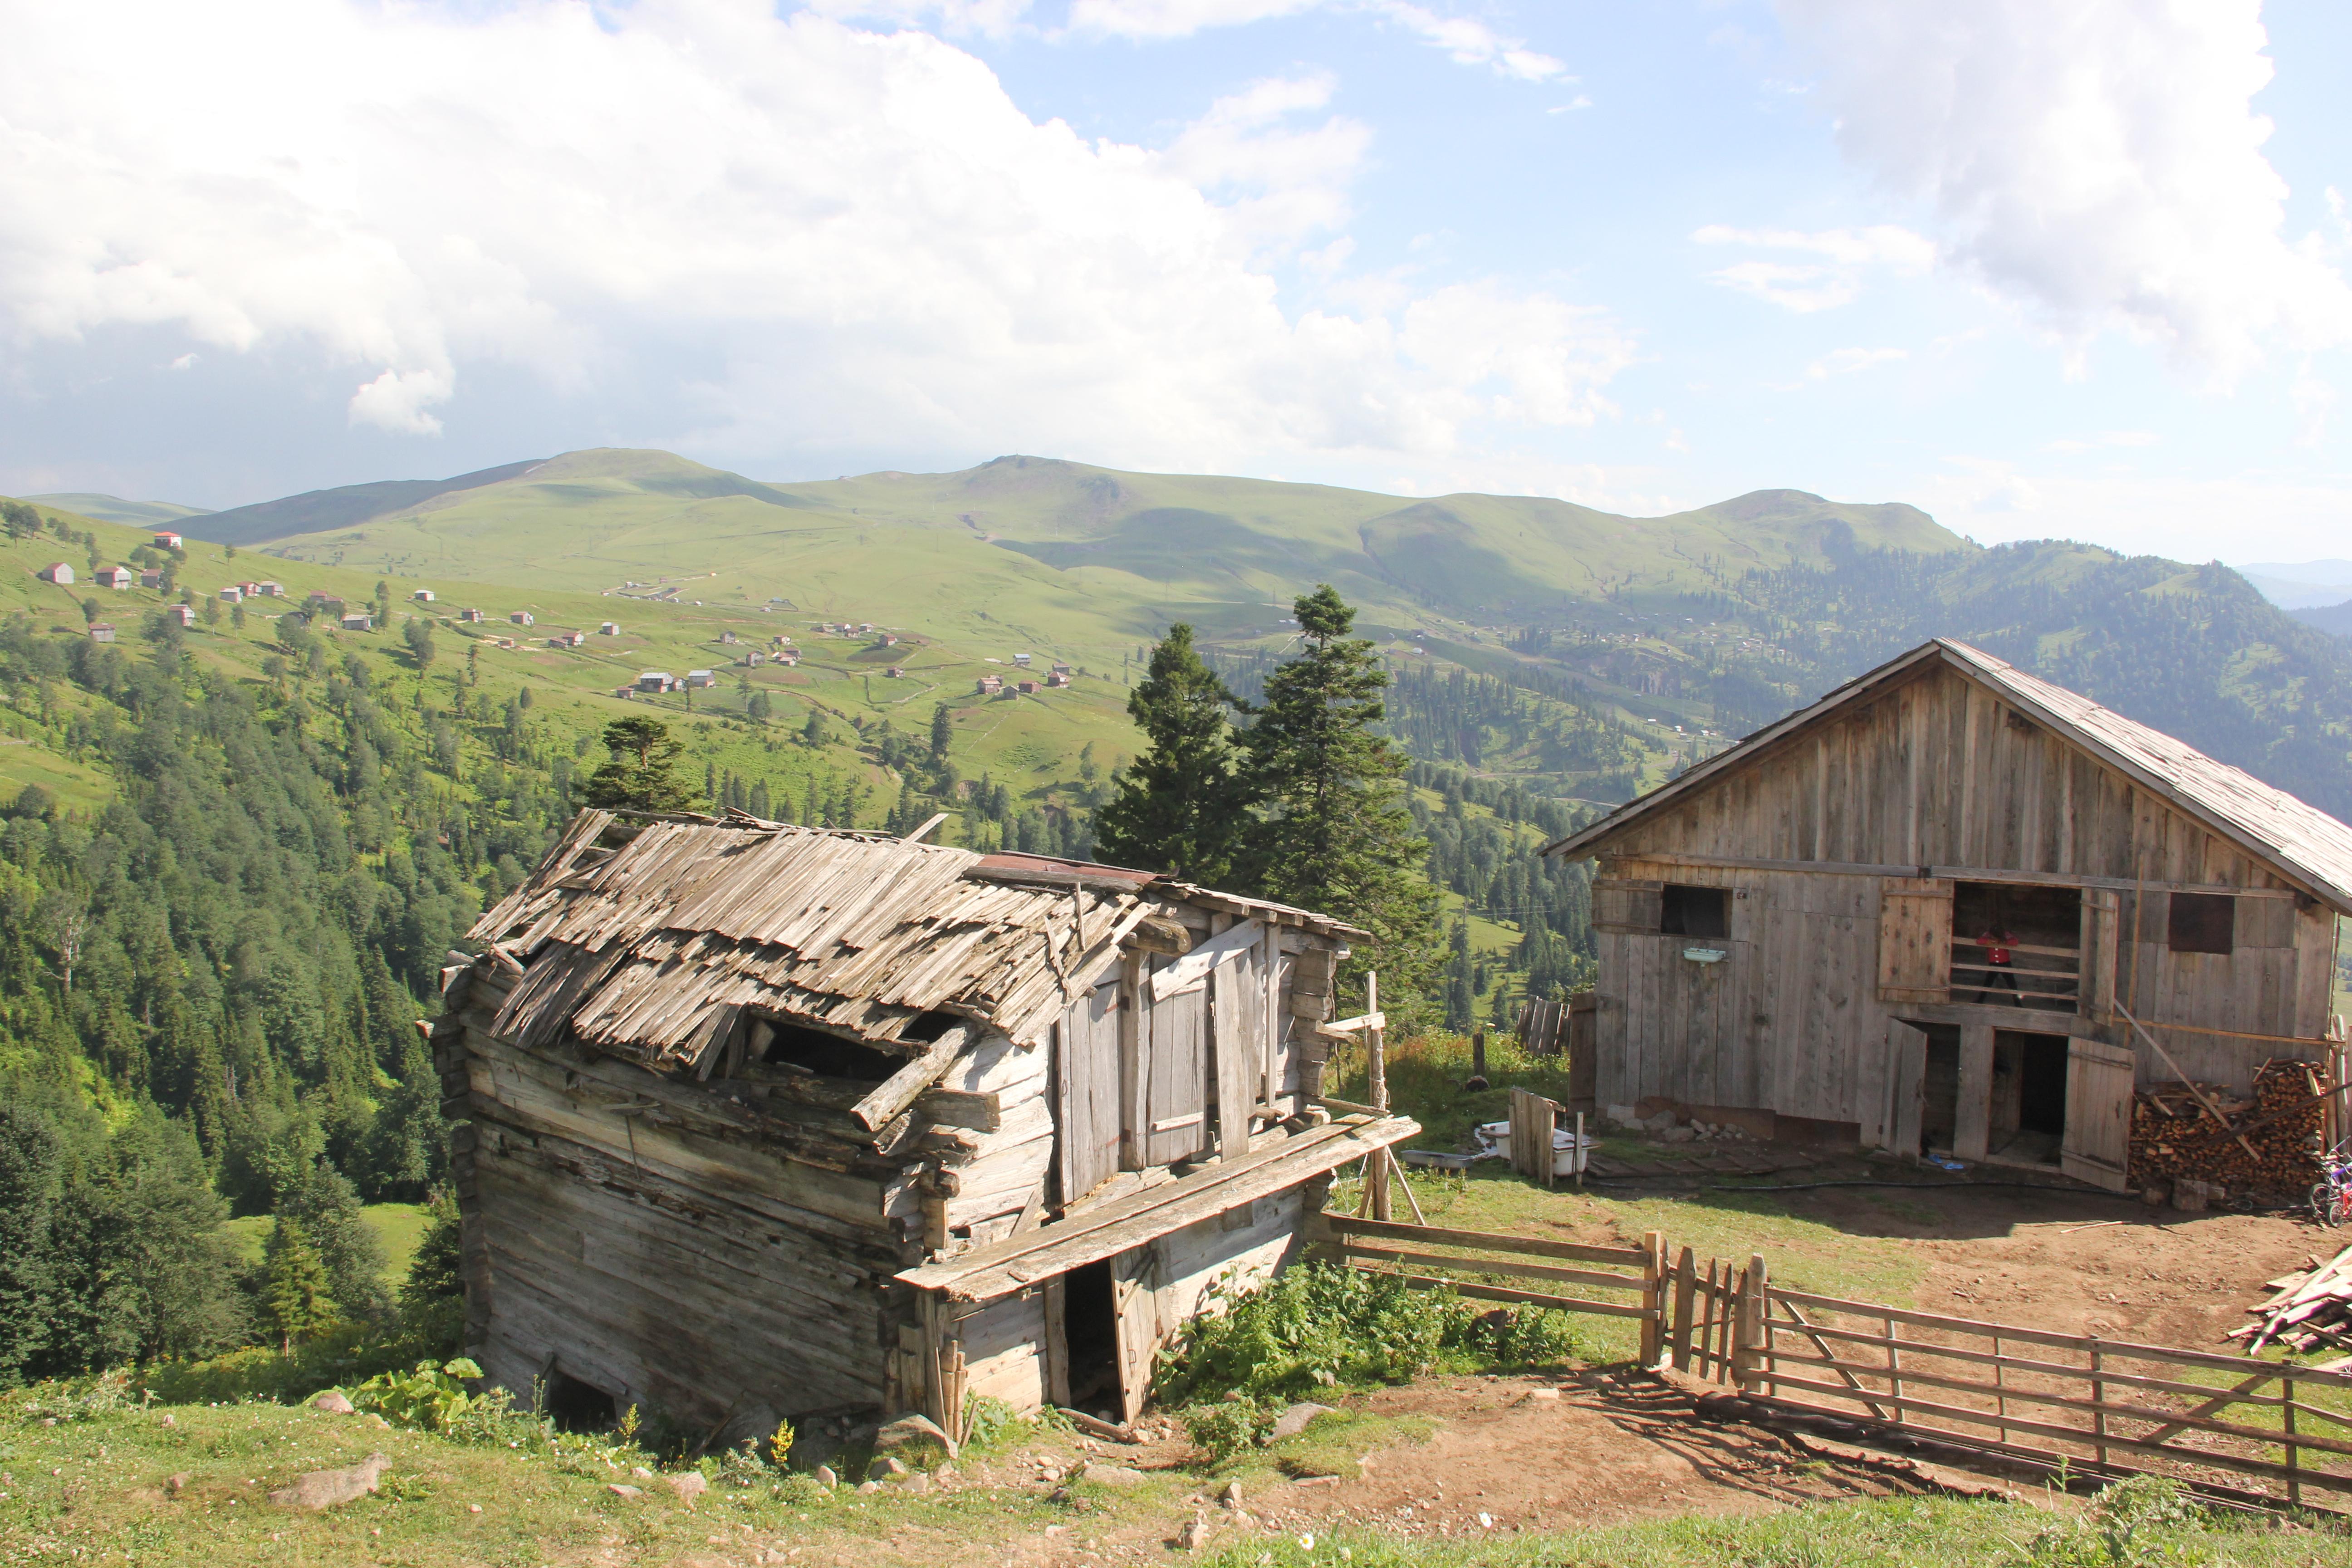 Georgia_CultureIMG_7422